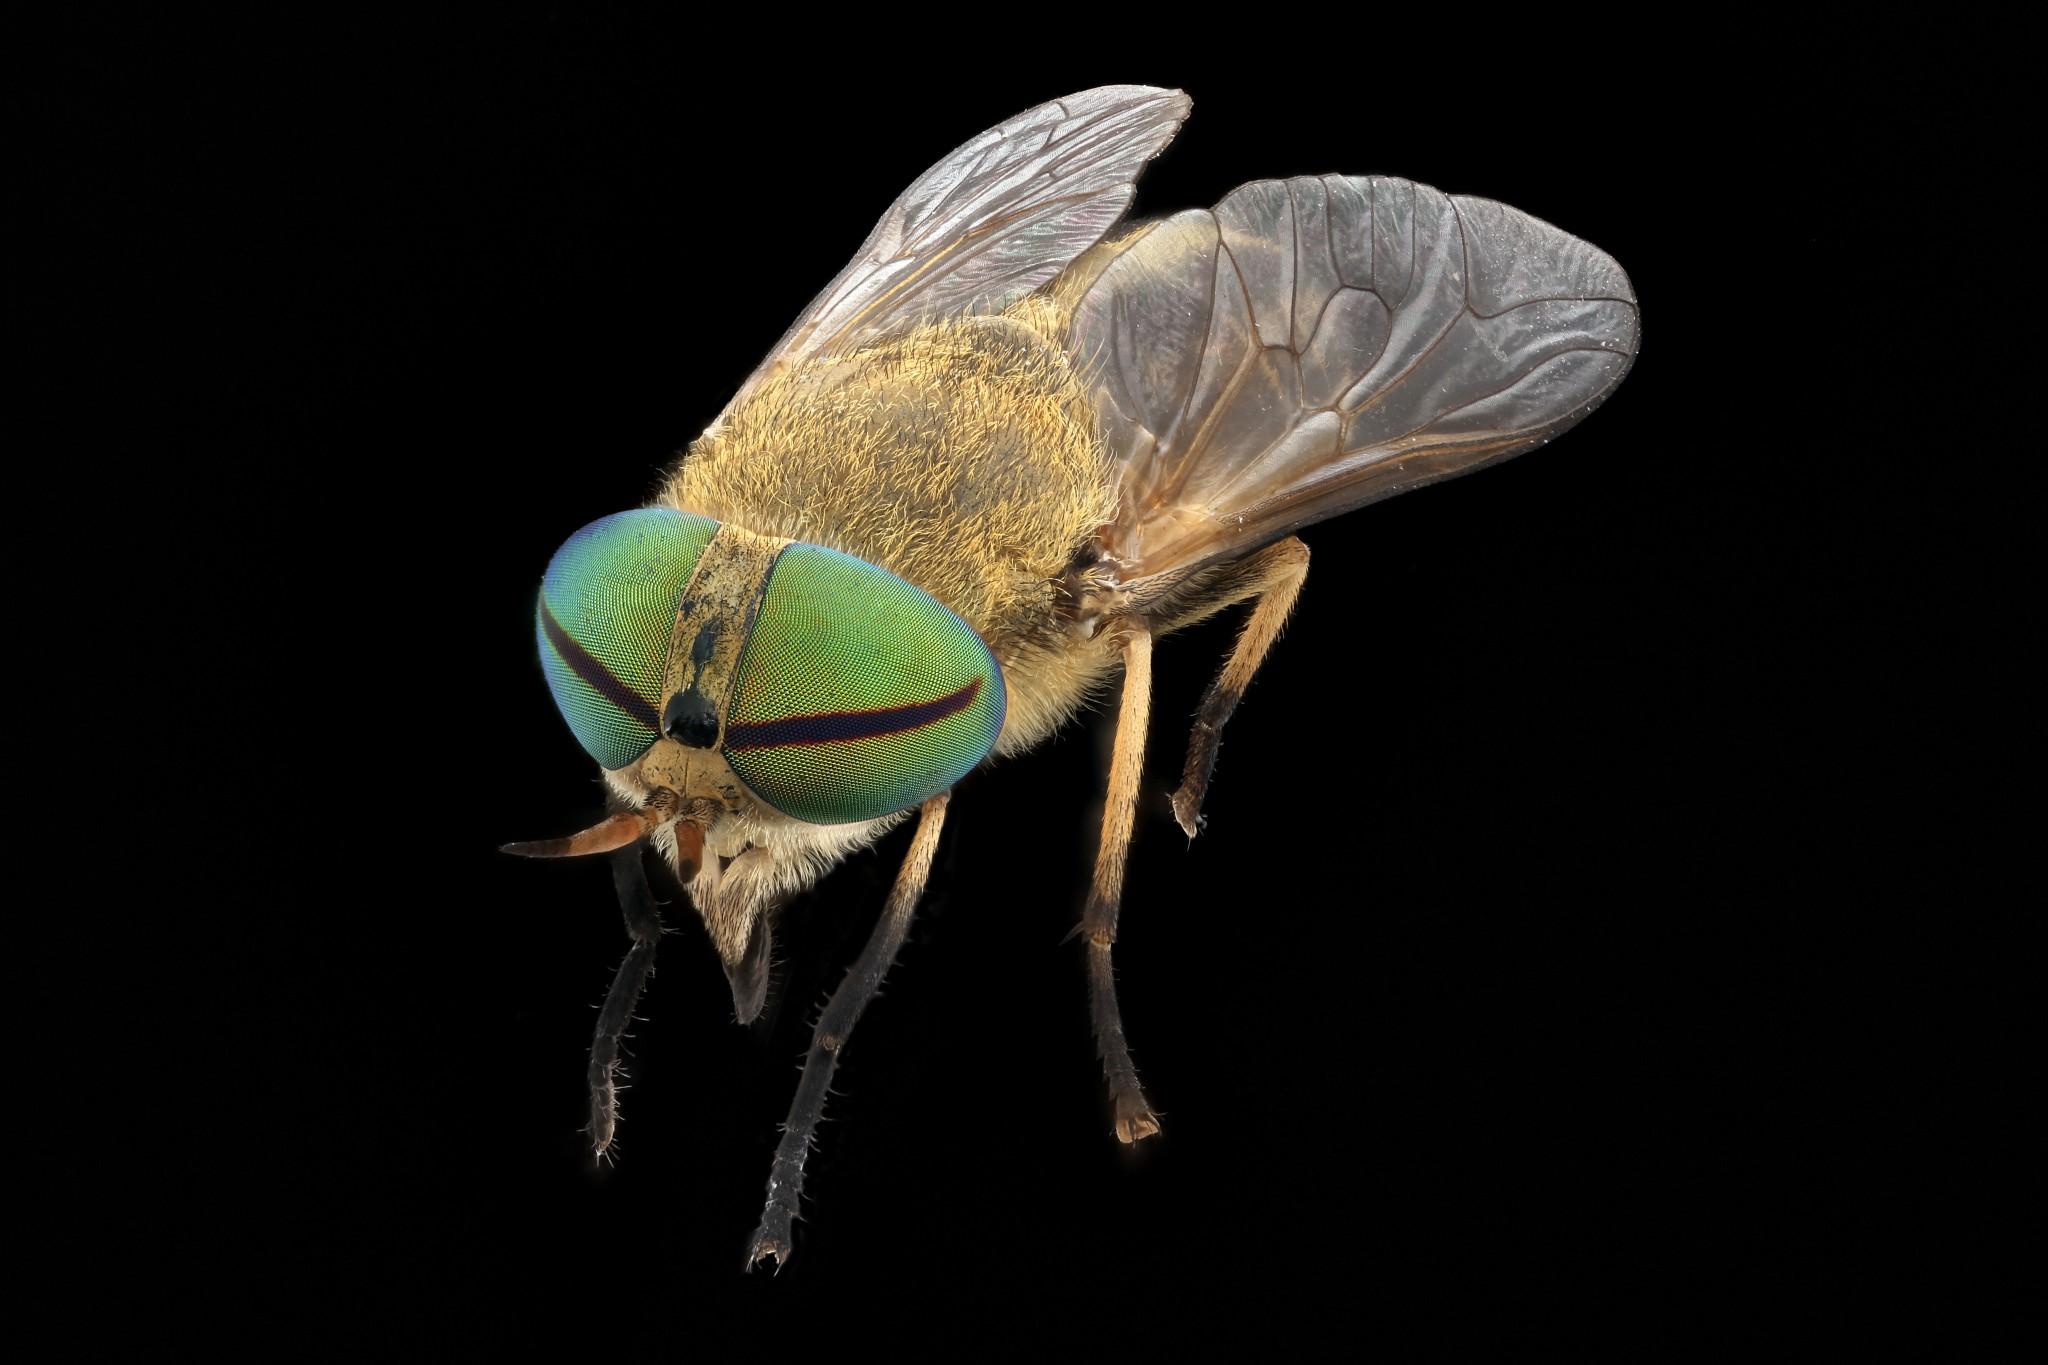 Horsefly - Tabanidae